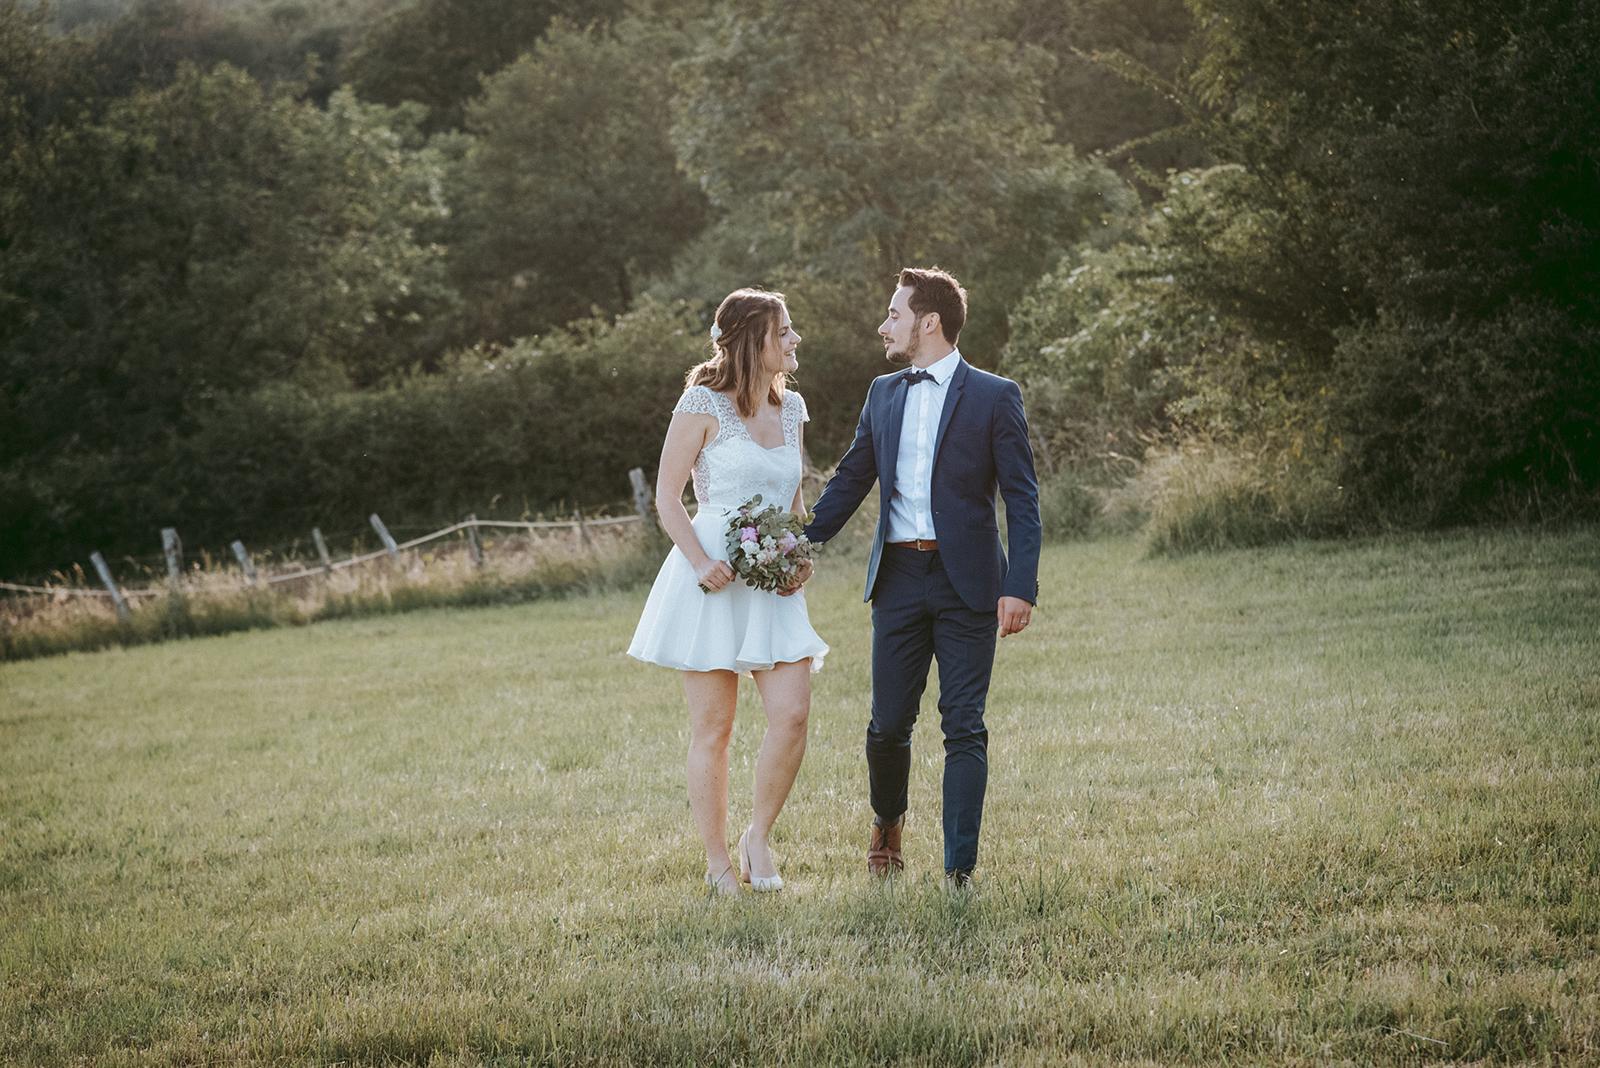 mariés qui marchent en se regardant